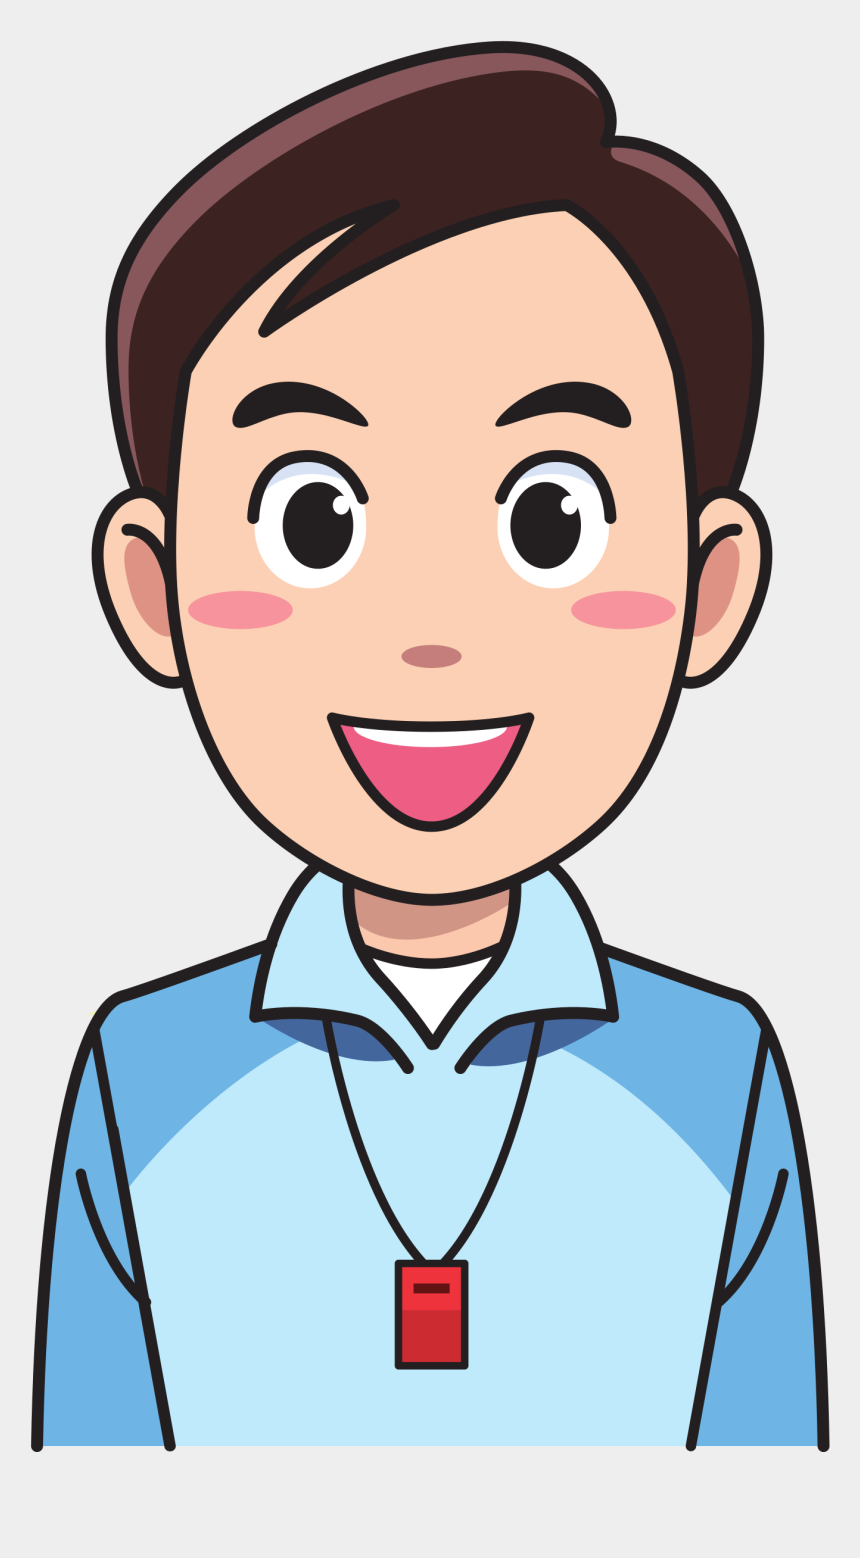 teacher clipart, Cartoons - Teacher - Physical Education Teacher Png